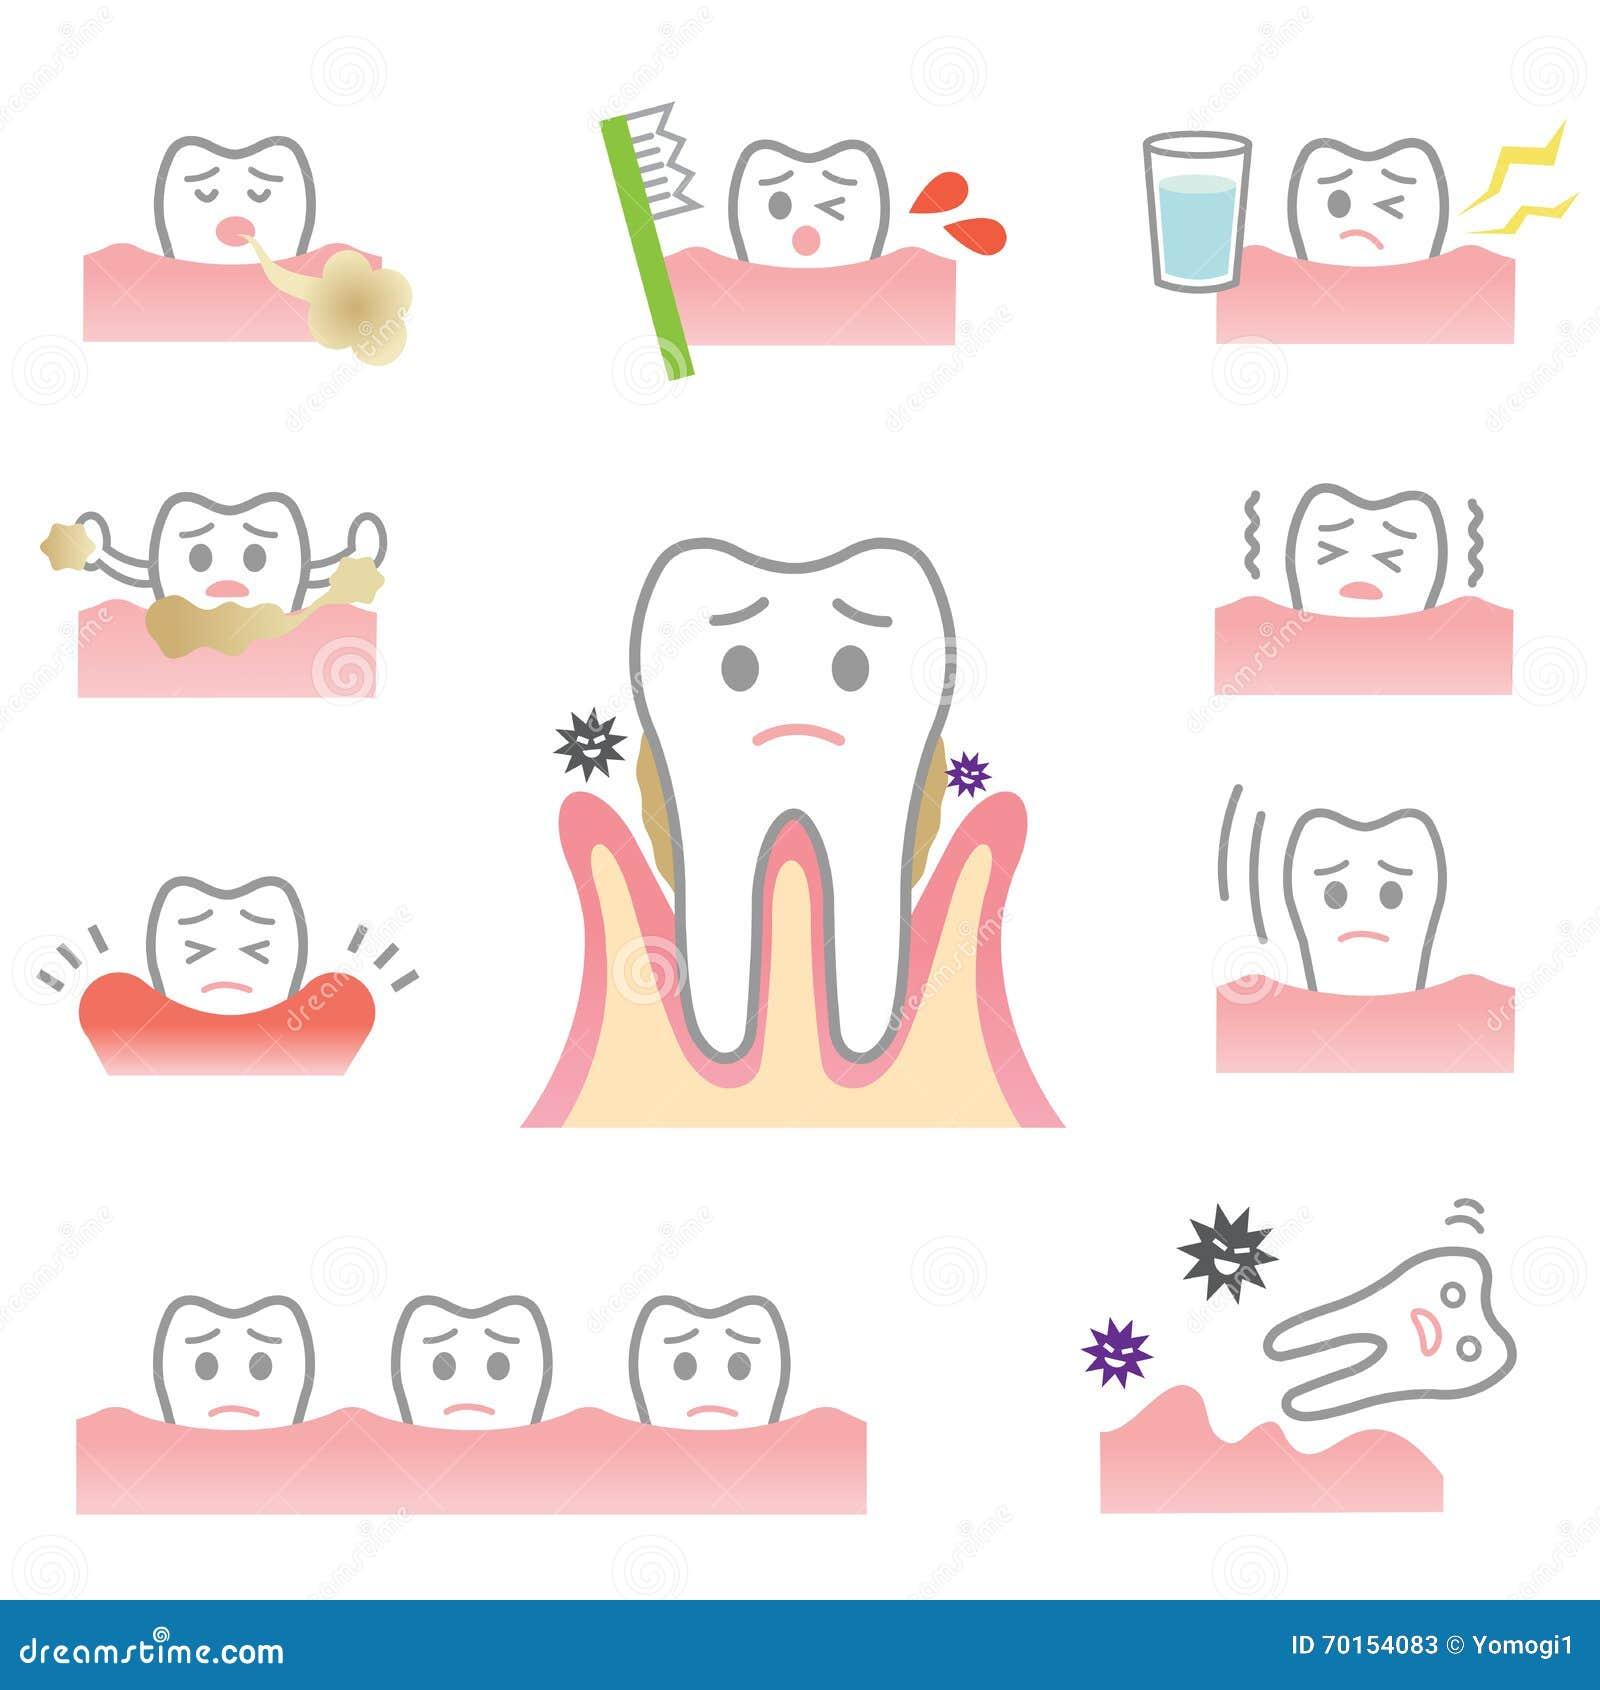 Periodontal Disease Stock Vector - Image: 70154083